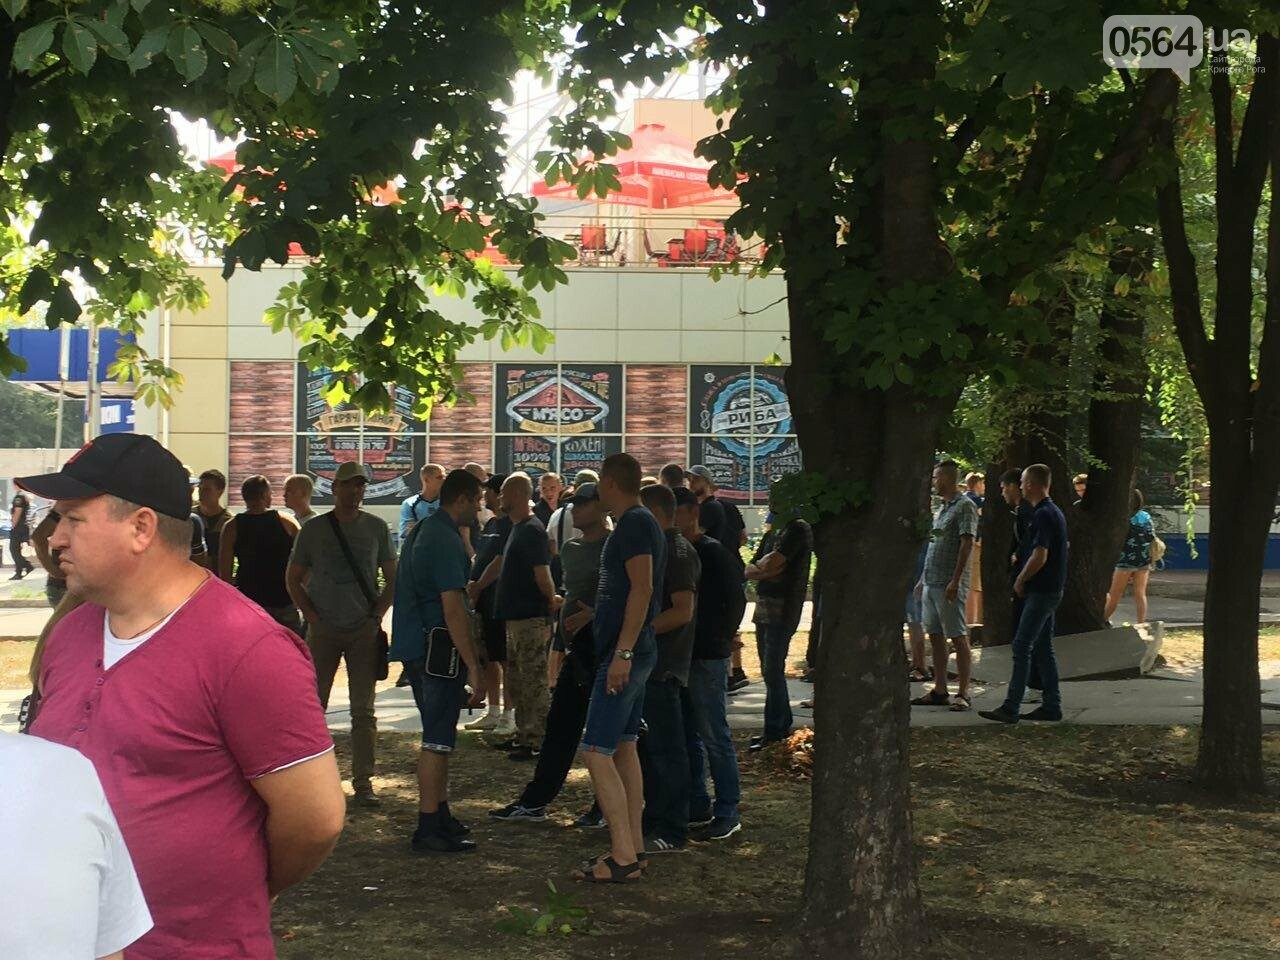 Трубят рога: В Кривом Роге собрались противники ЛГБТ-движения, - ФОТО, ВИДЕО, фото-6